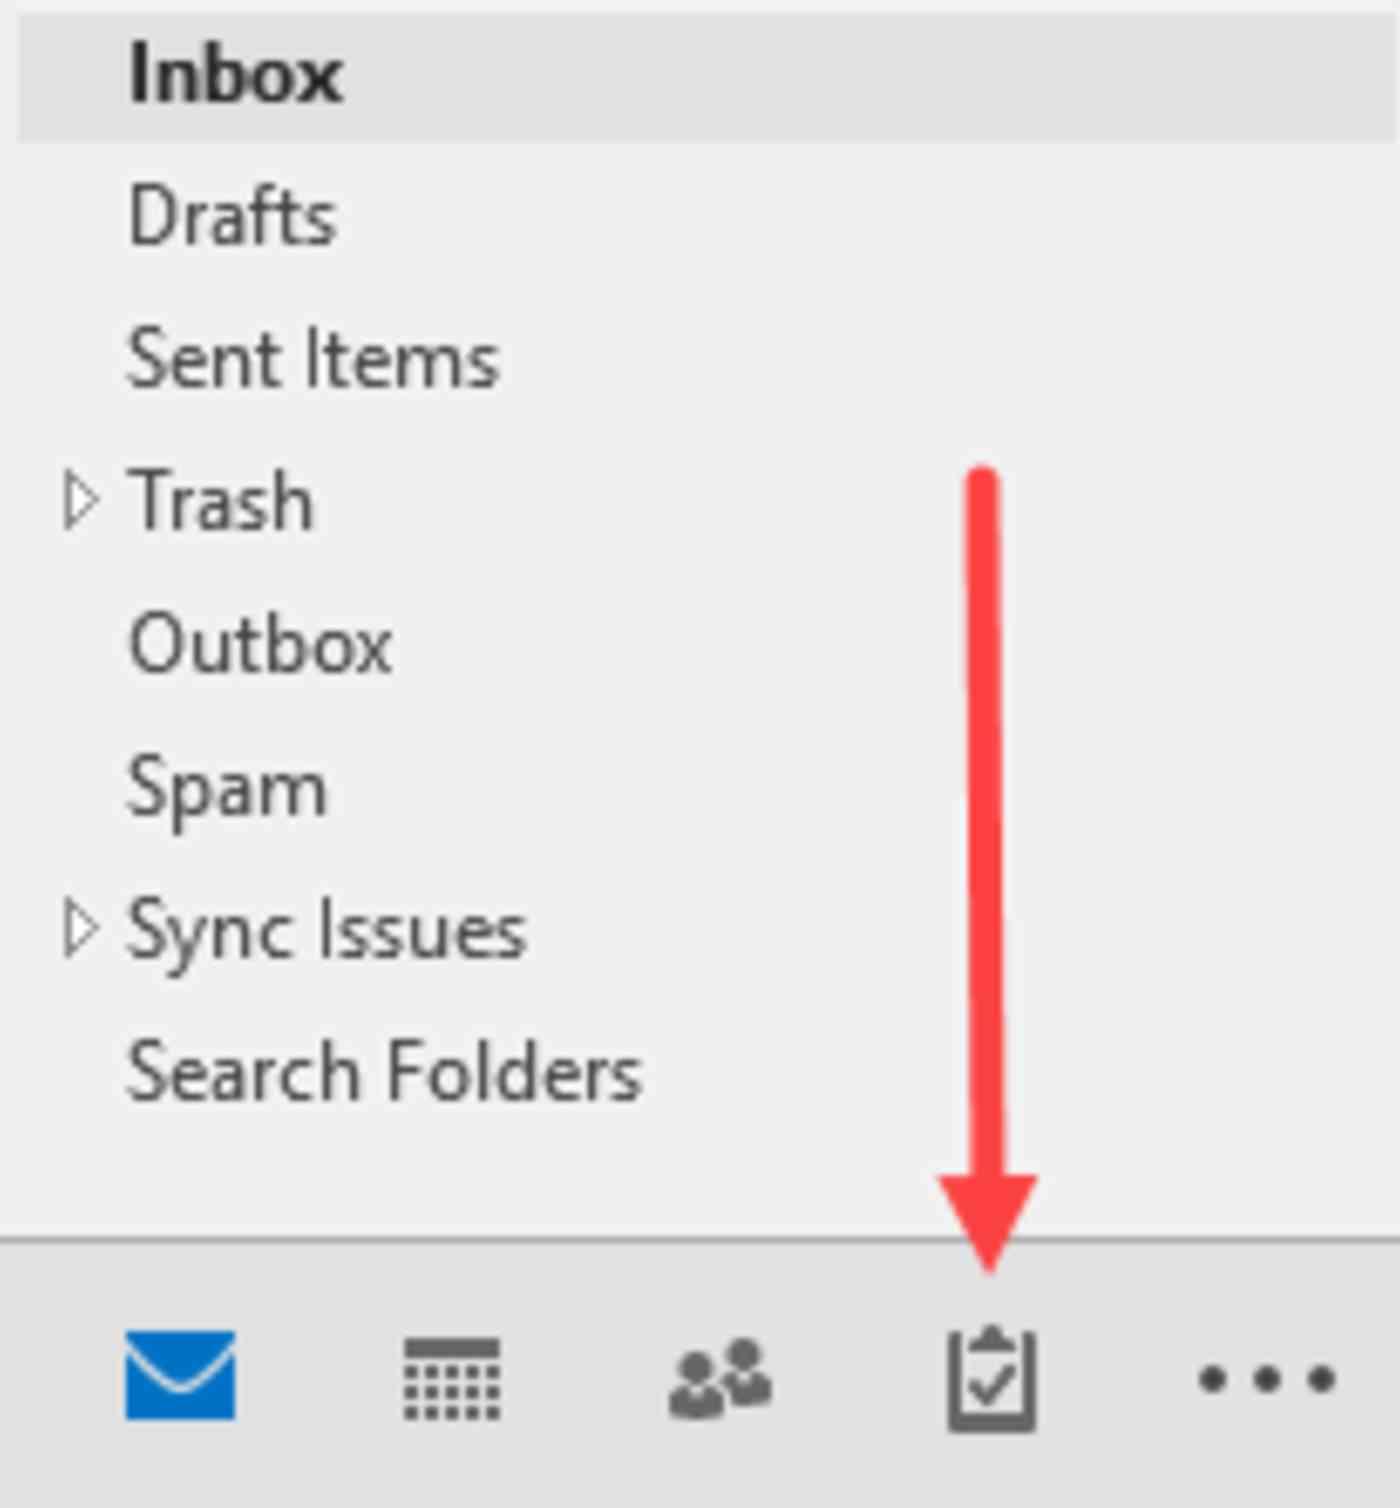 Microsoft Outlook task list